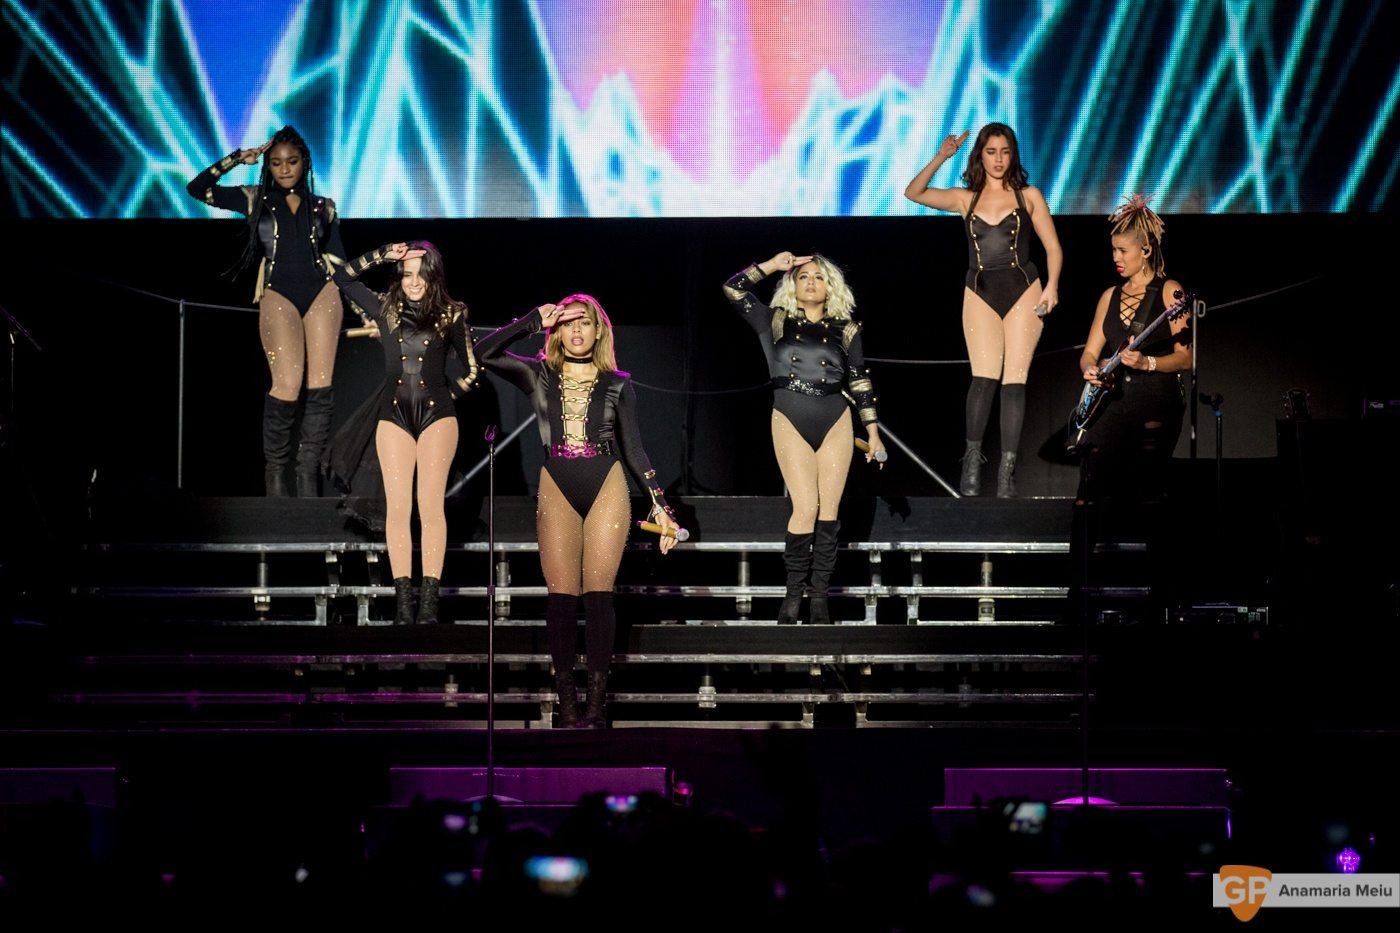 Fifth Harmony at 3Arena by Anamaria Meiu